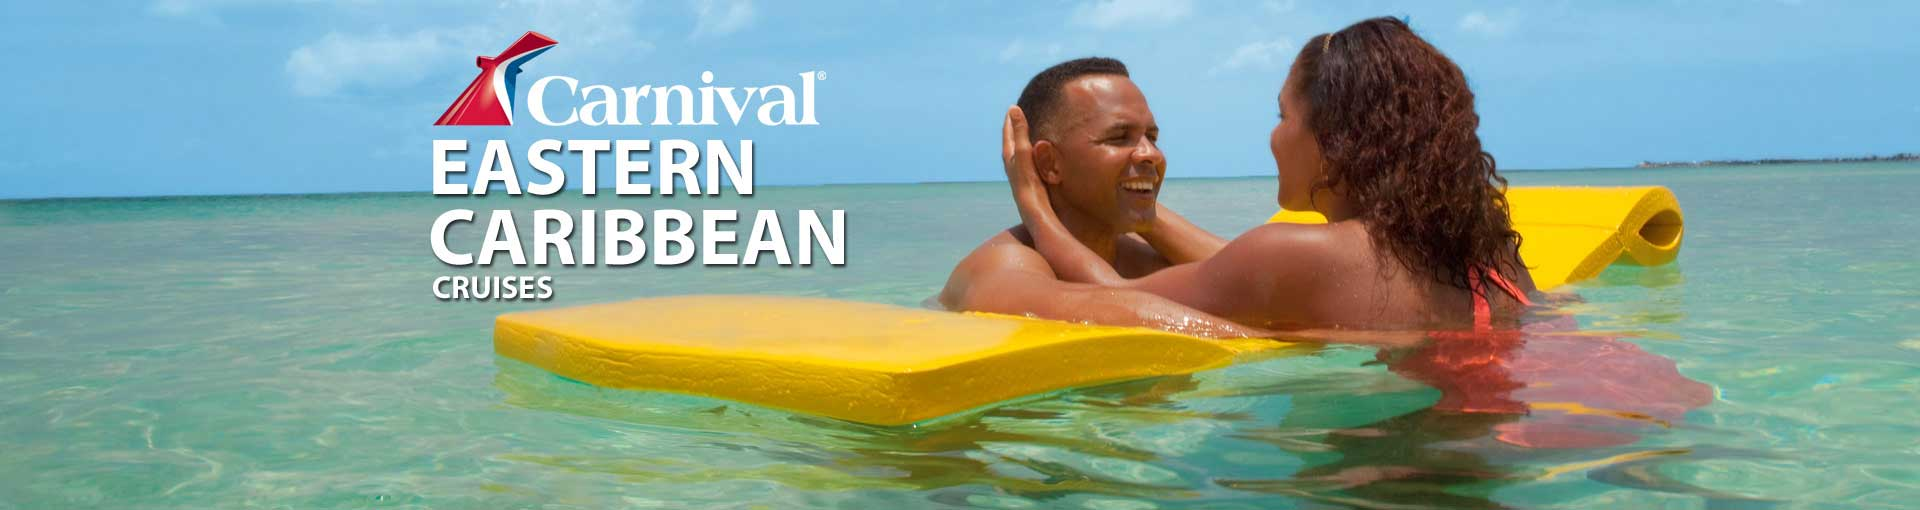 Carnival Eastern Caribbean Cruises 2018 And 2019 Eastern